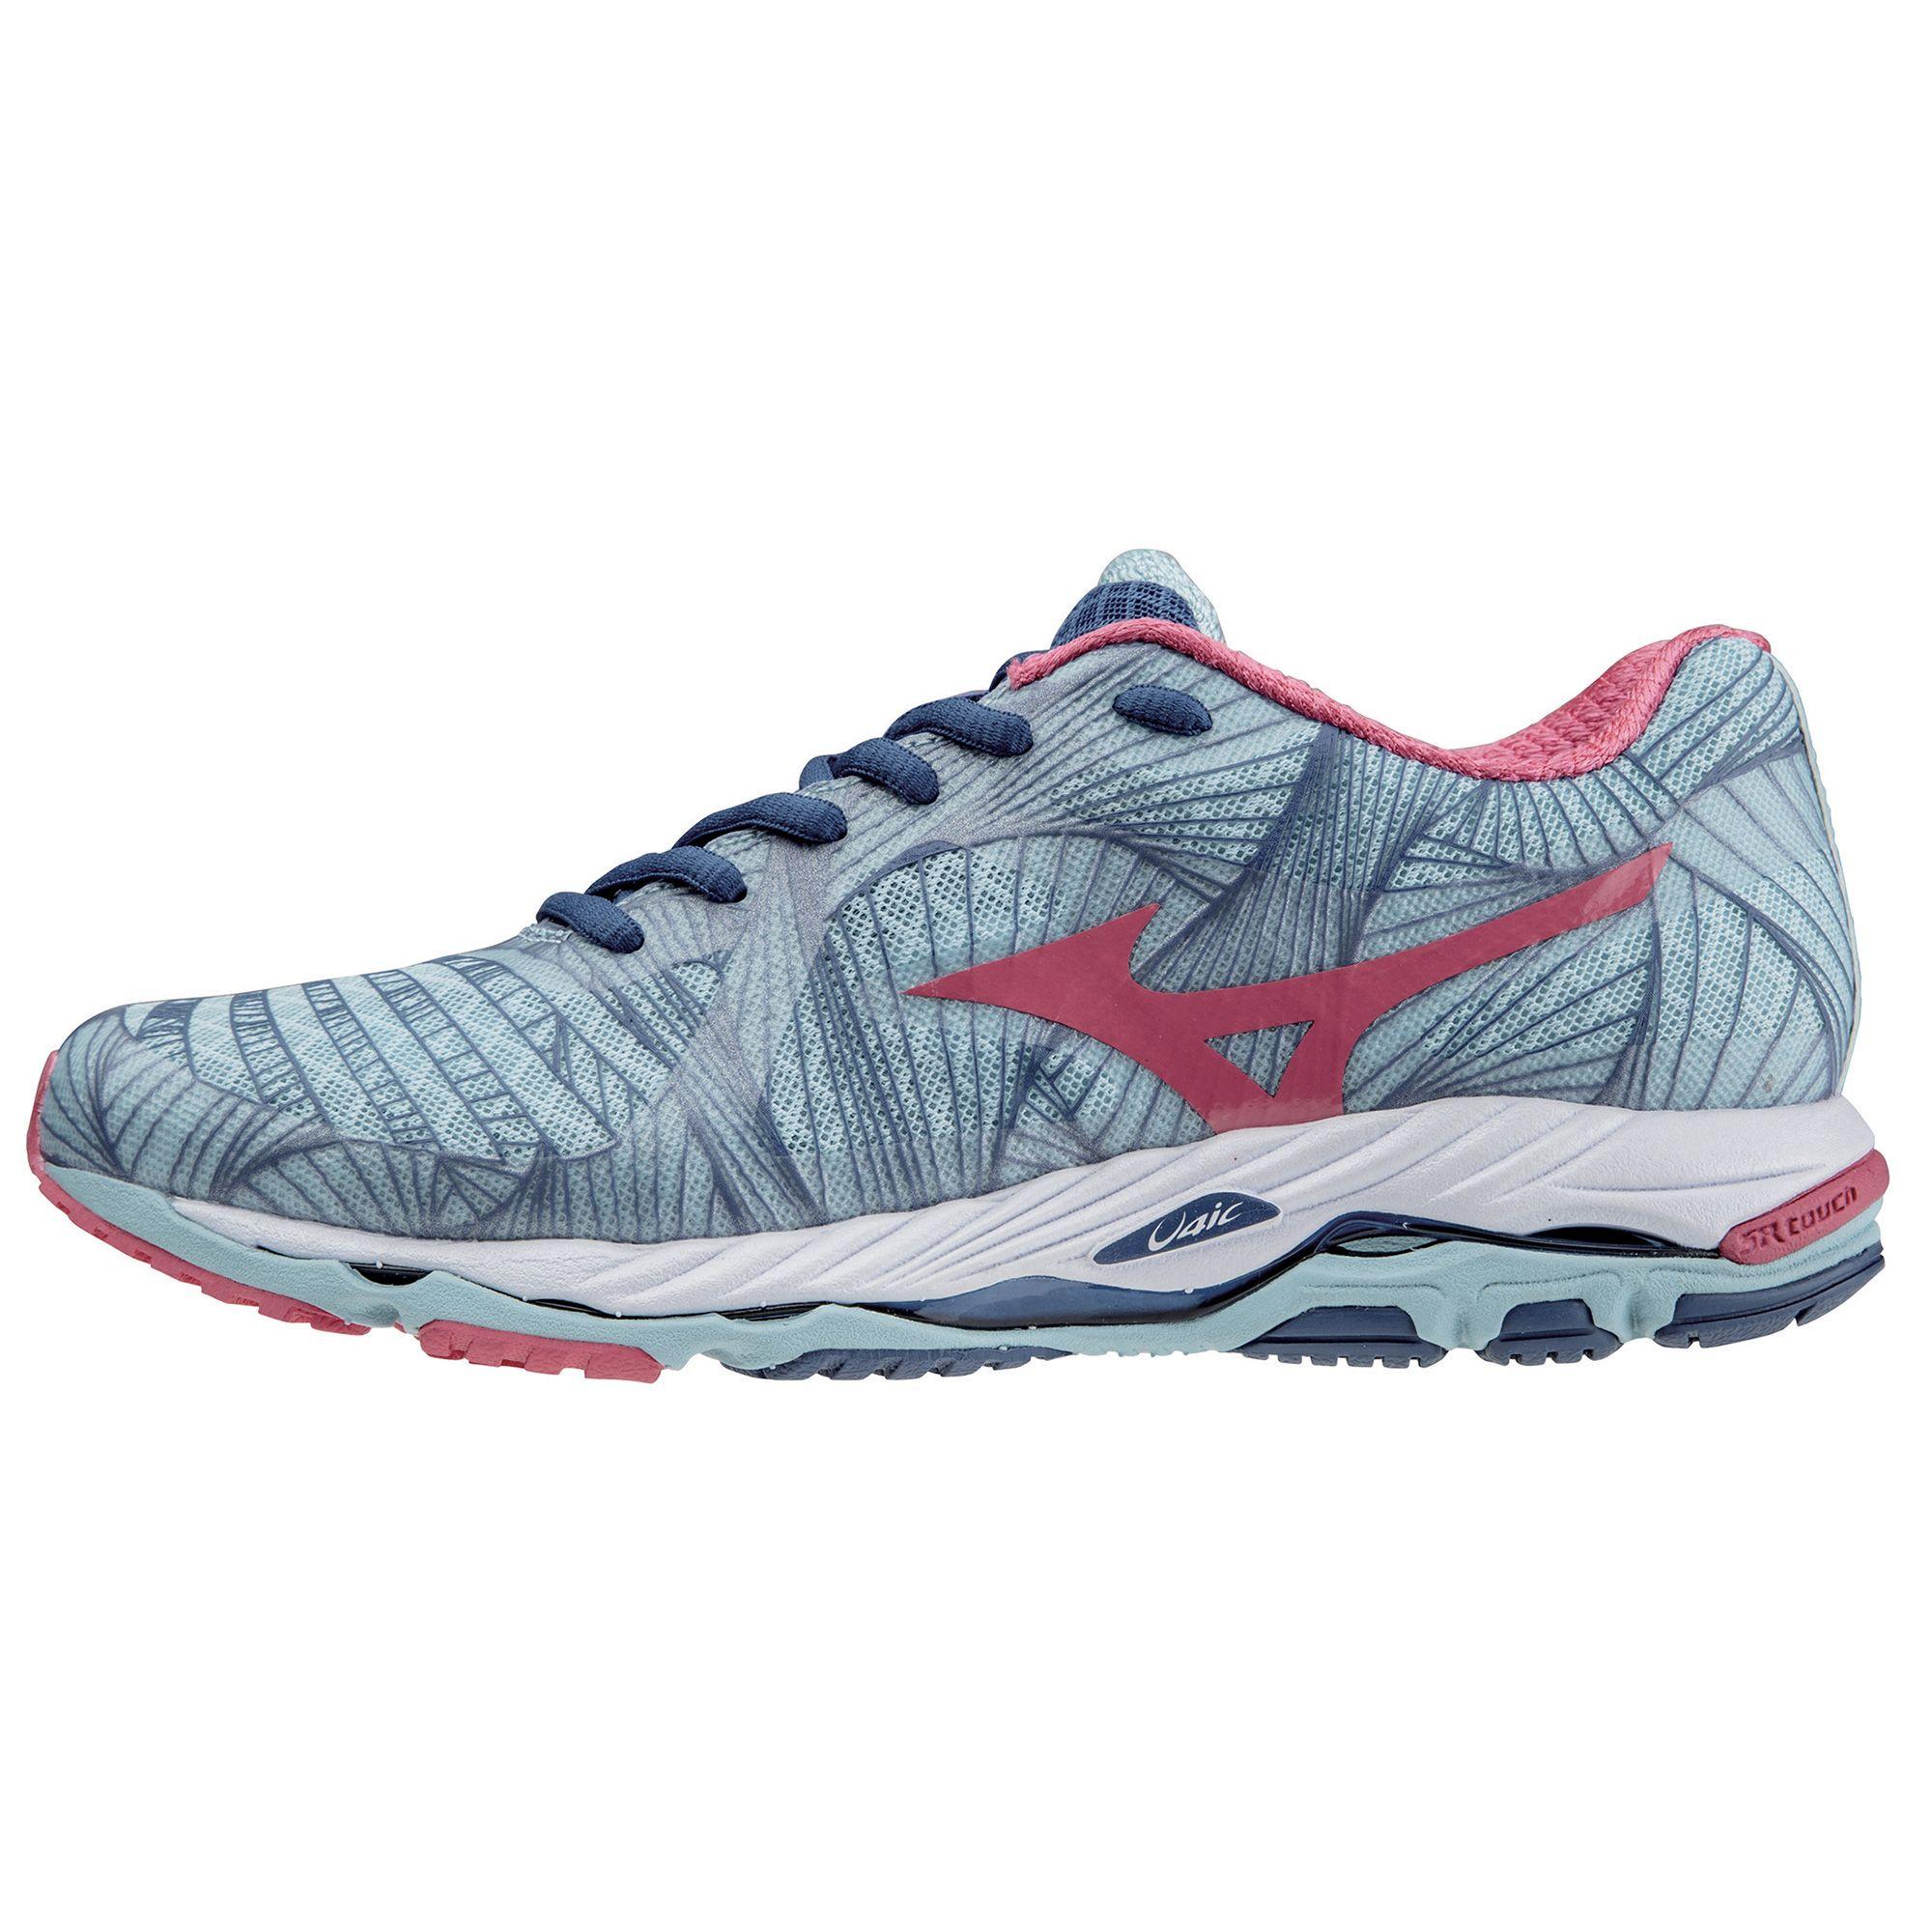 Mizuno Wave Paradox Womens Running Shoes Review